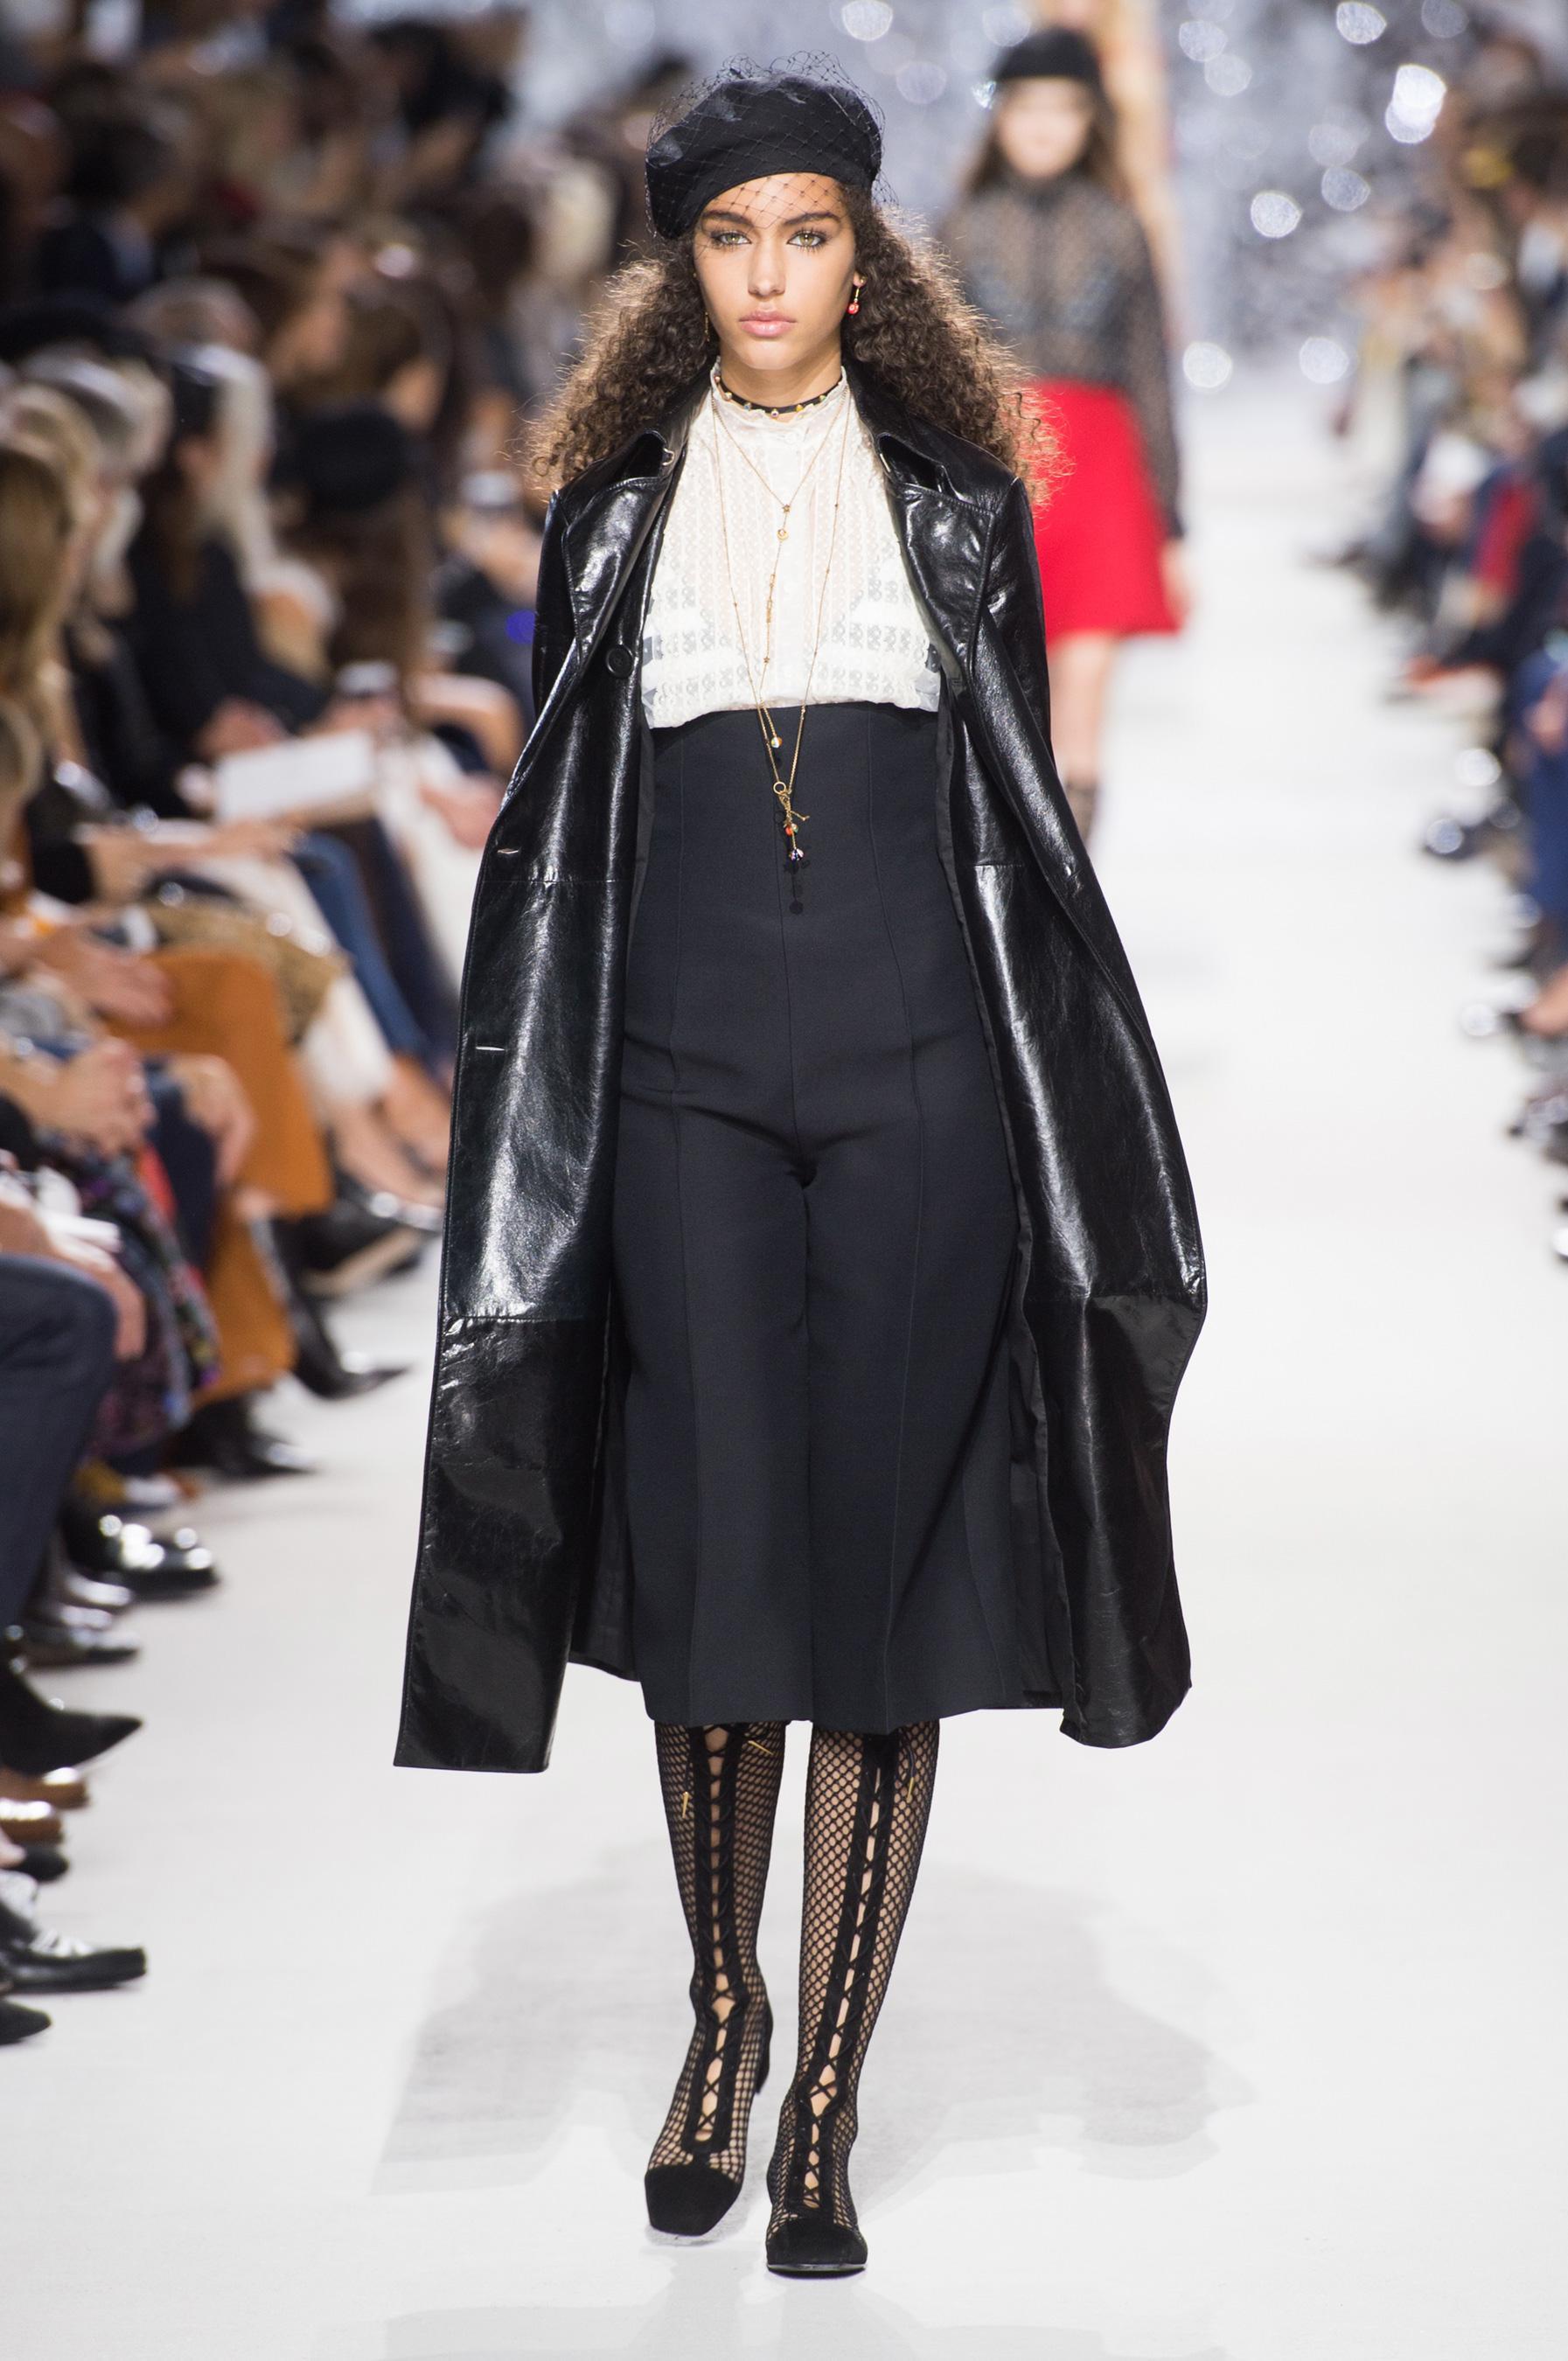 Christian Dior весна лето 2018 кожаное пальто